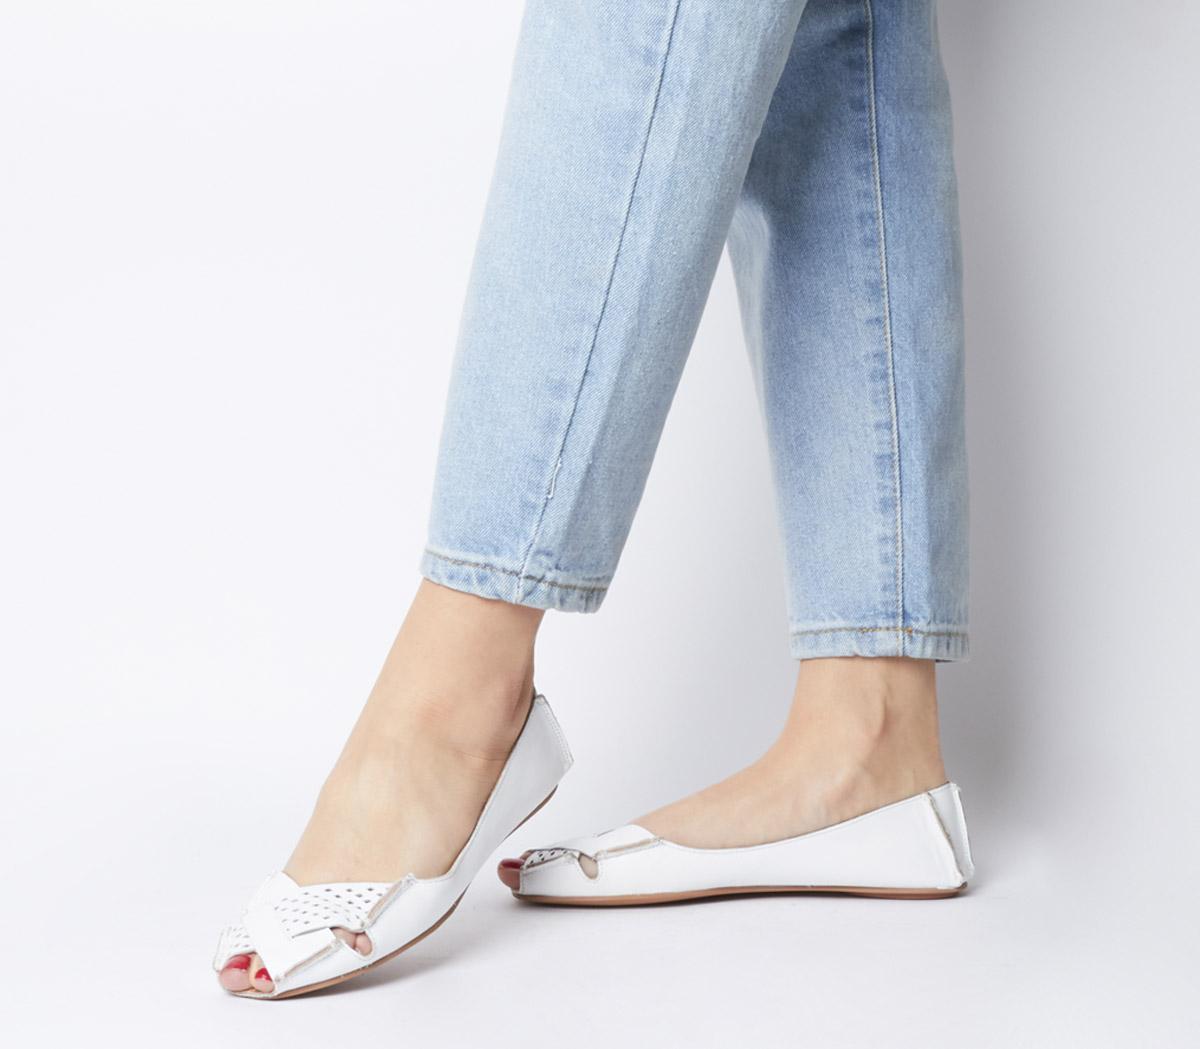 Felt Peep Toe Shoes White Leather - Flats